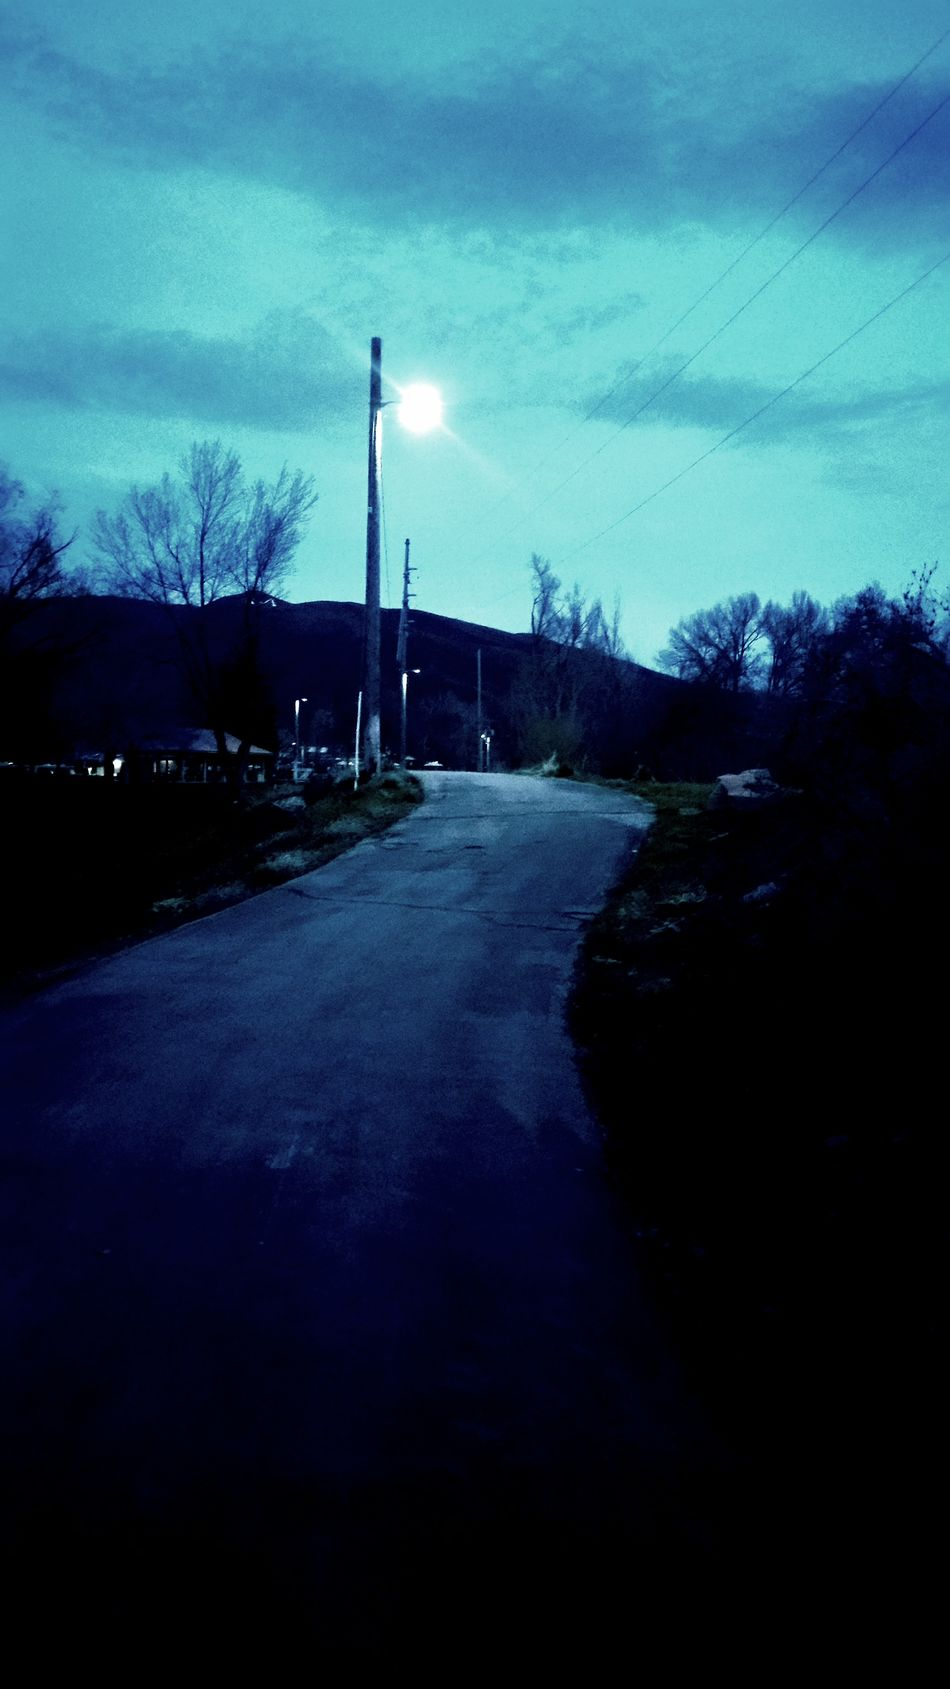 Original Photo Nature Original Original Photography Original Edits Bestshot Utah Streetlamp Night Night Time Favorite Favorite Place Ever favorite Favorite Place Park Riverside